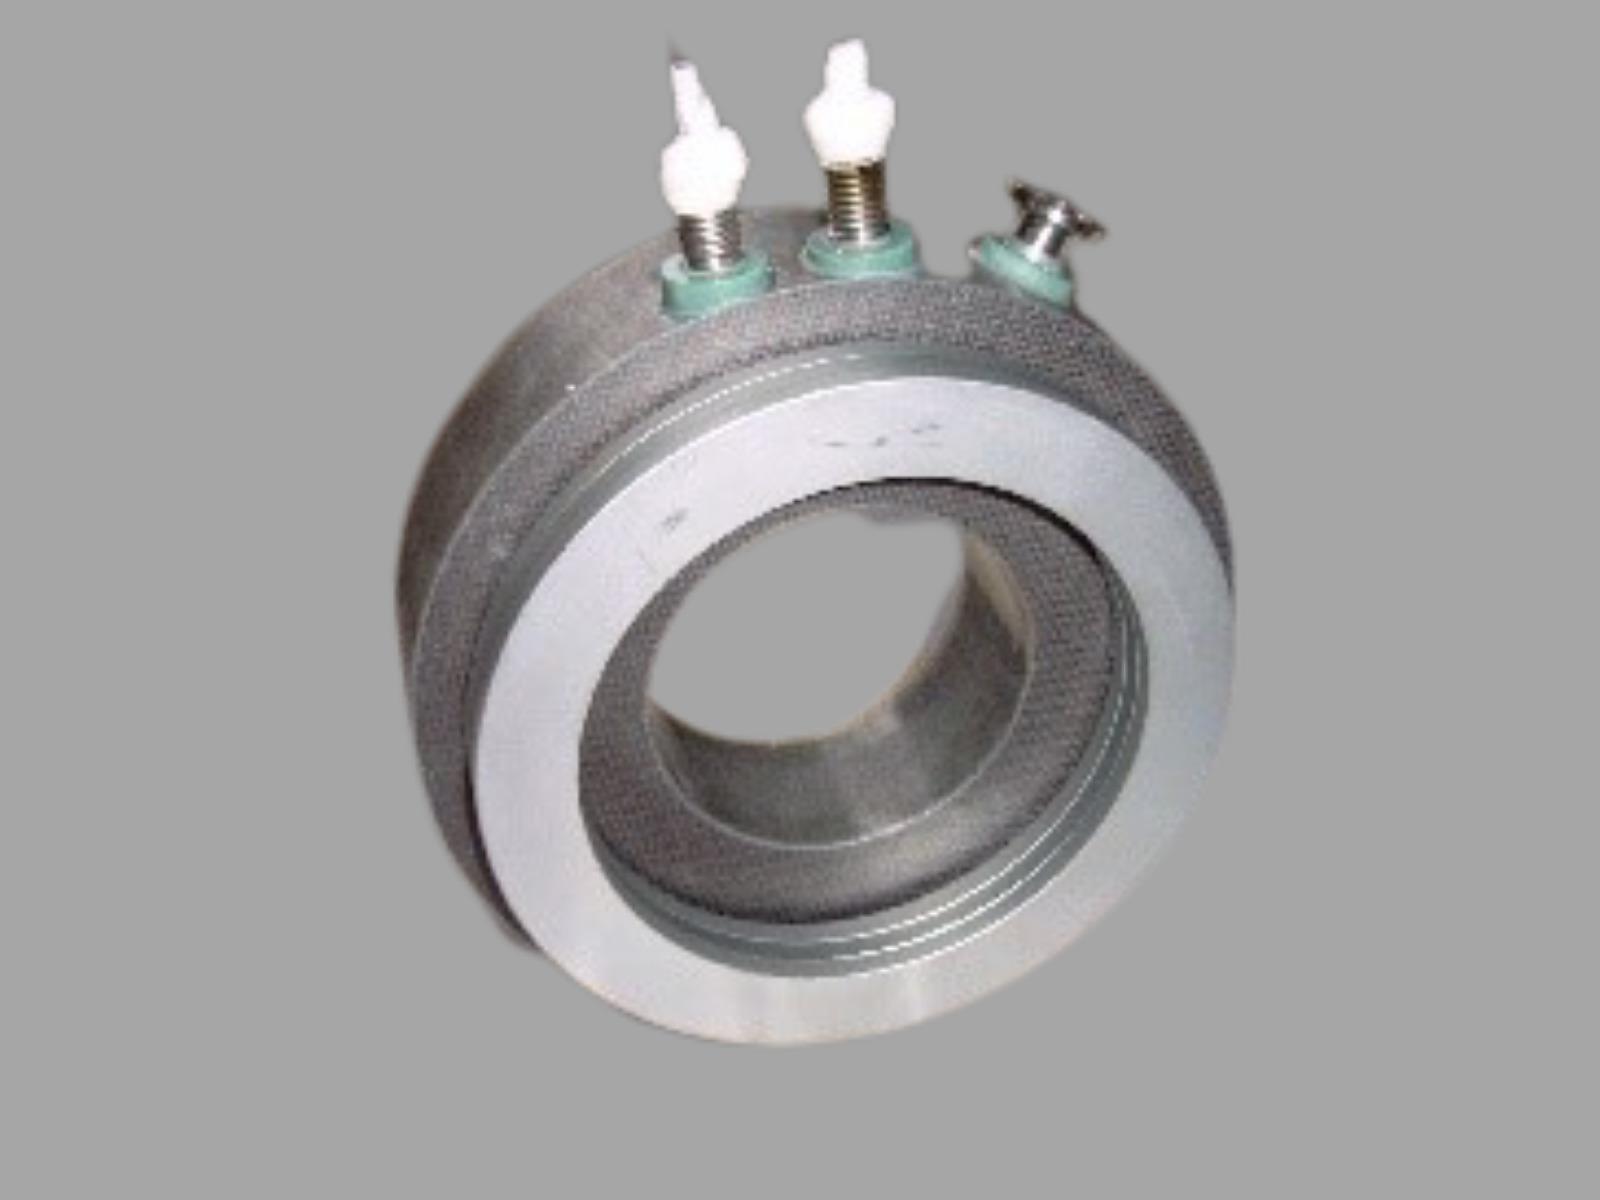 Superconducting magnetic bearing